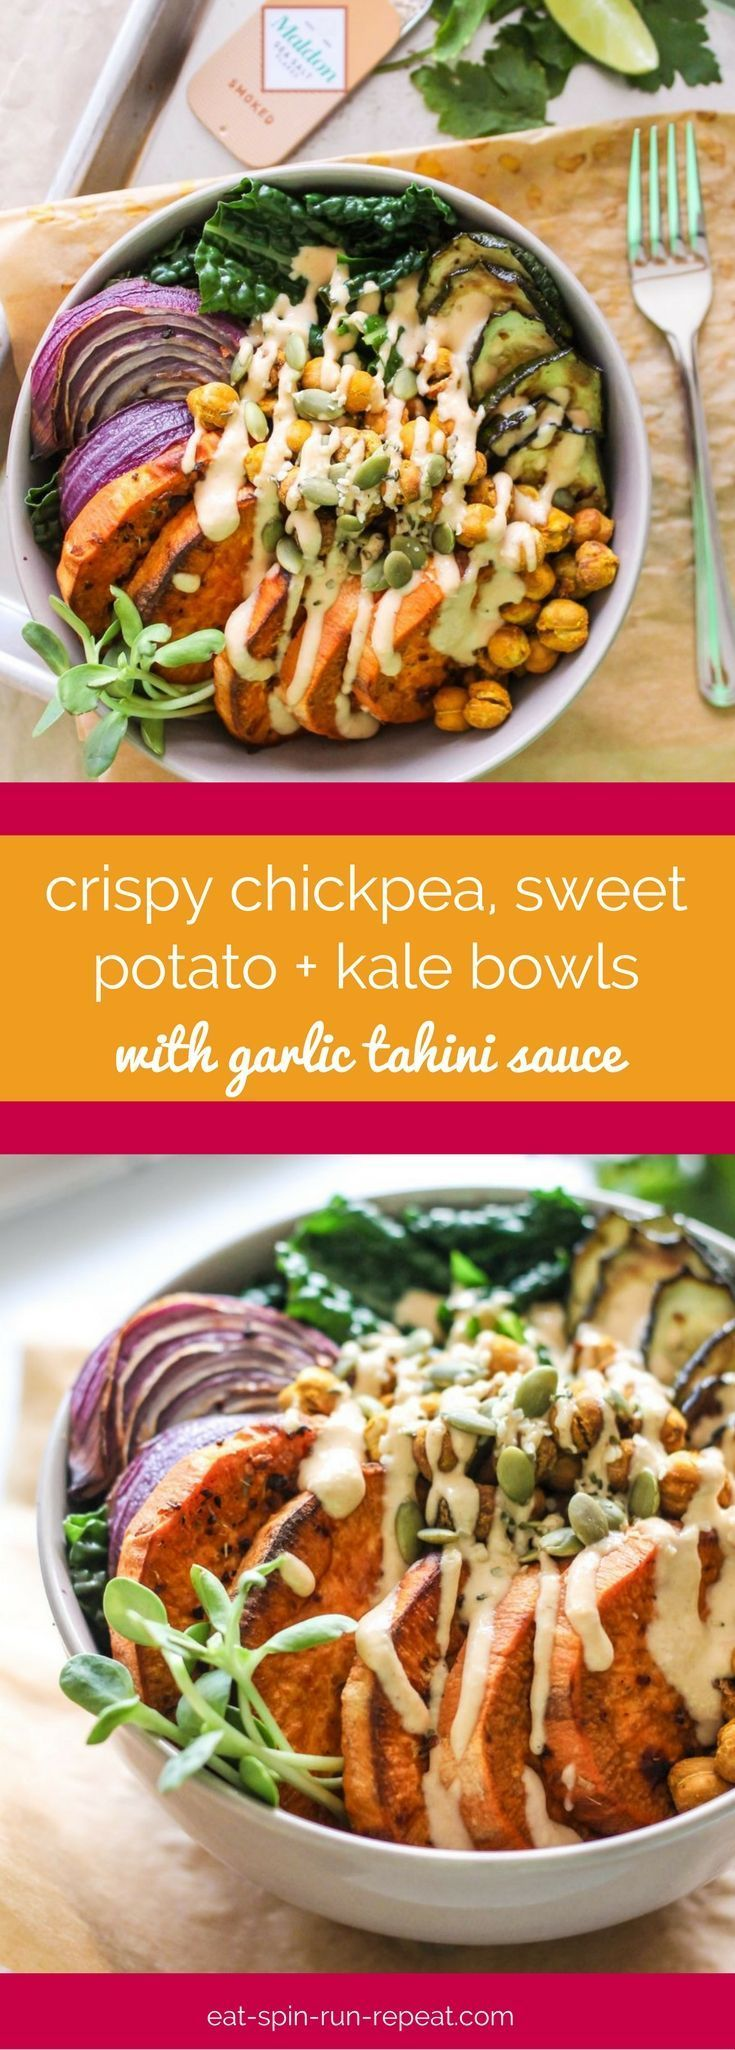 Crispy Chickpea Sweet Potato And Kale Bowls With Garlic Tahini Sauce